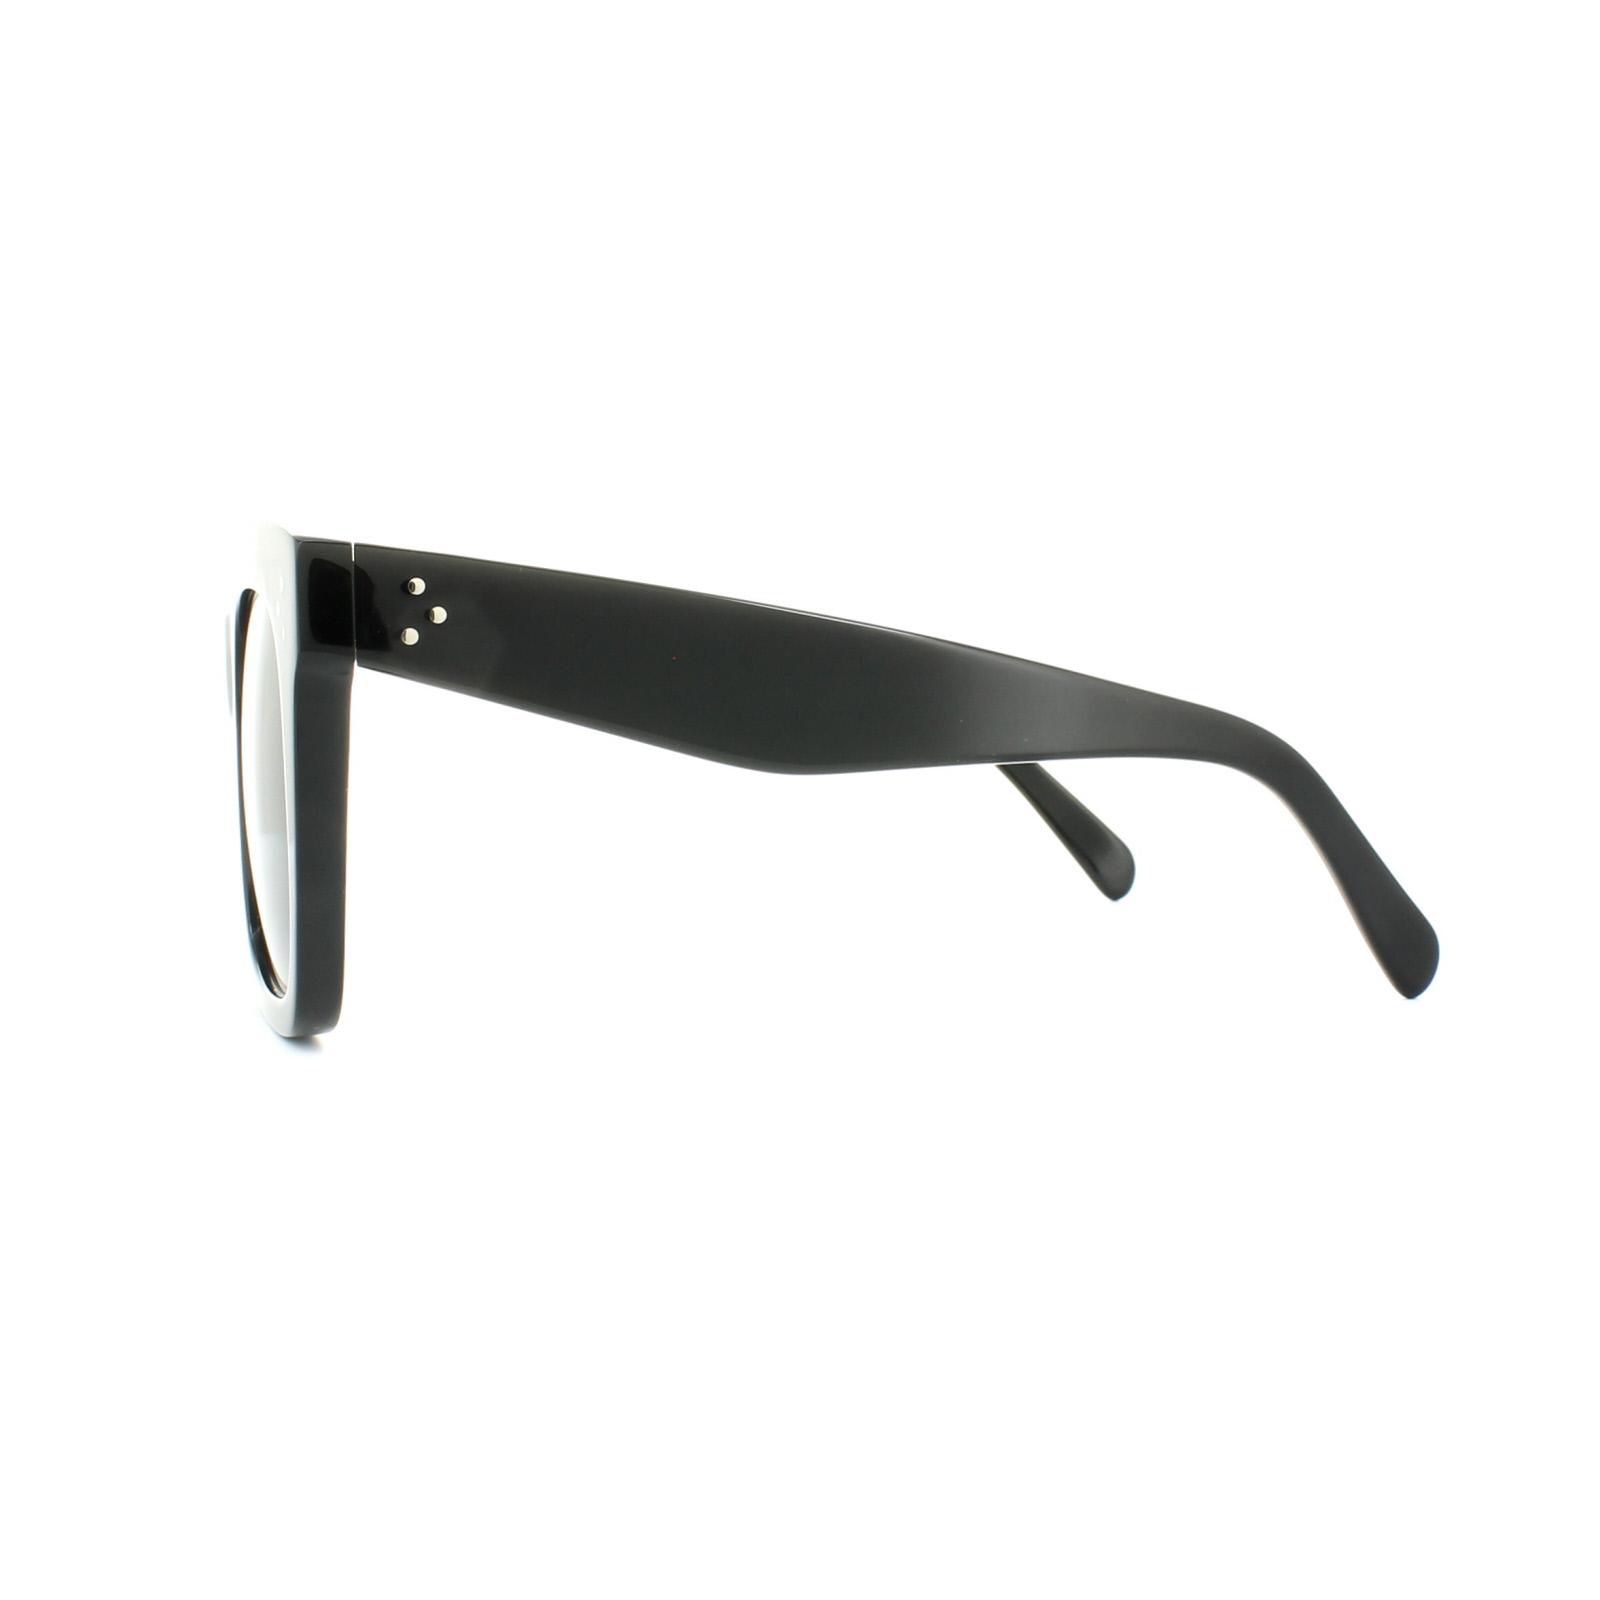 4448c8915625 ... Celine Sunglasses 41076/S Tilda 807 BN Black Dark Grey Thumbnail 3 ...